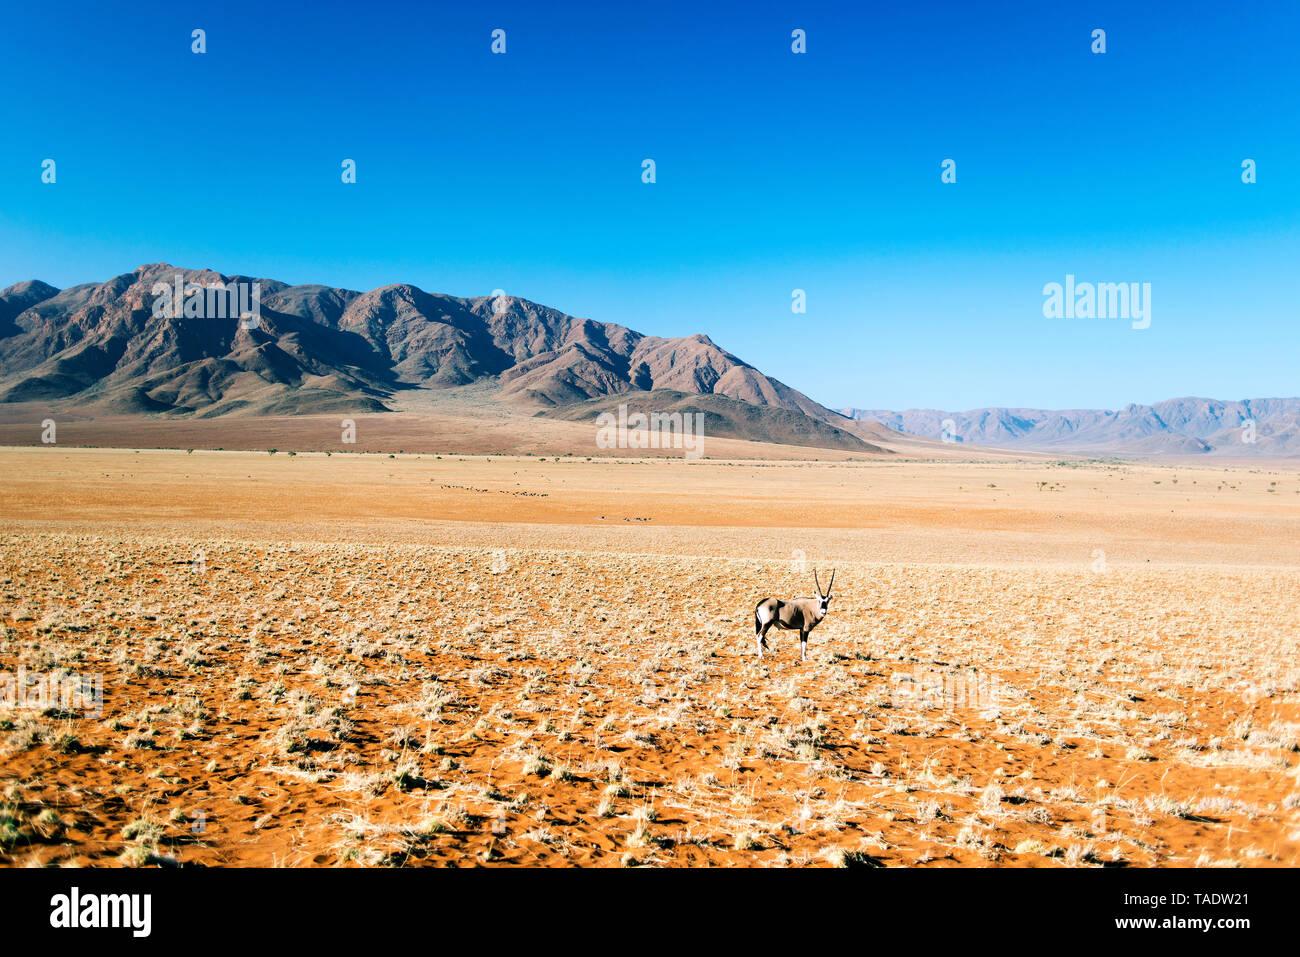 An antilop in Africa in desert - Stock Image